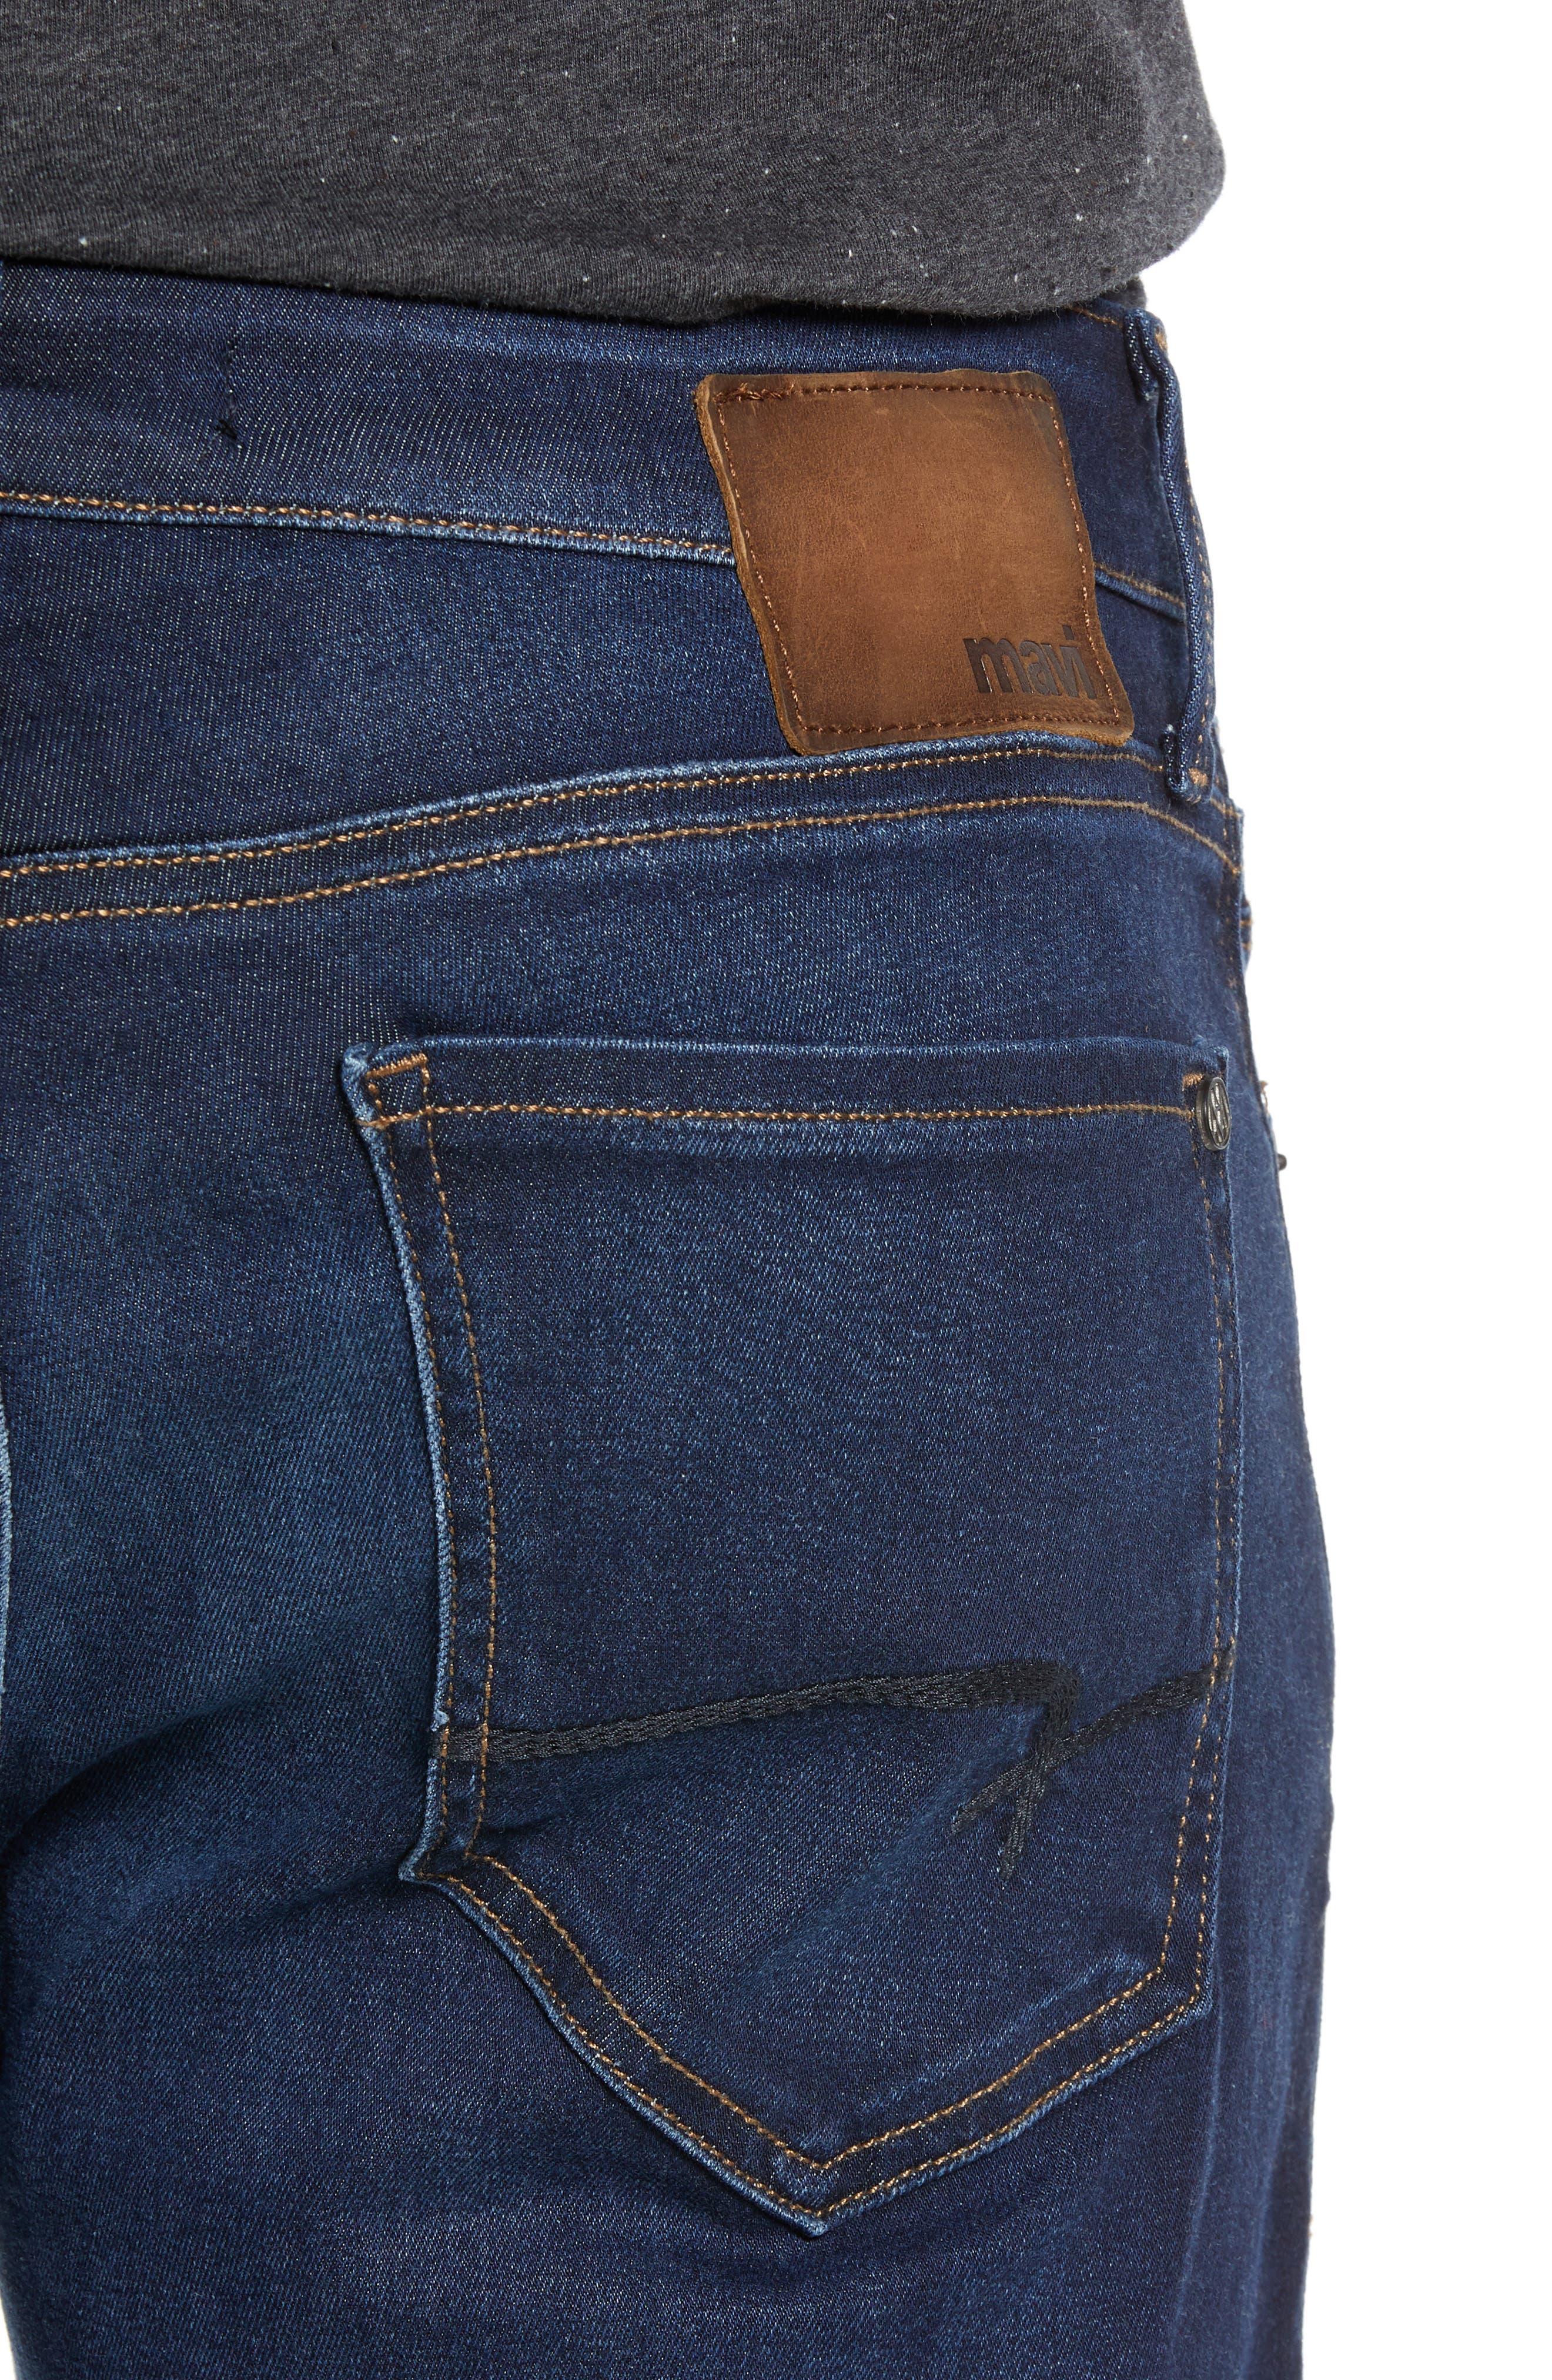 Zach Straight Leg Jeans,                             Alternate thumbnail 4, color,                             DEEP SOFT MOVE